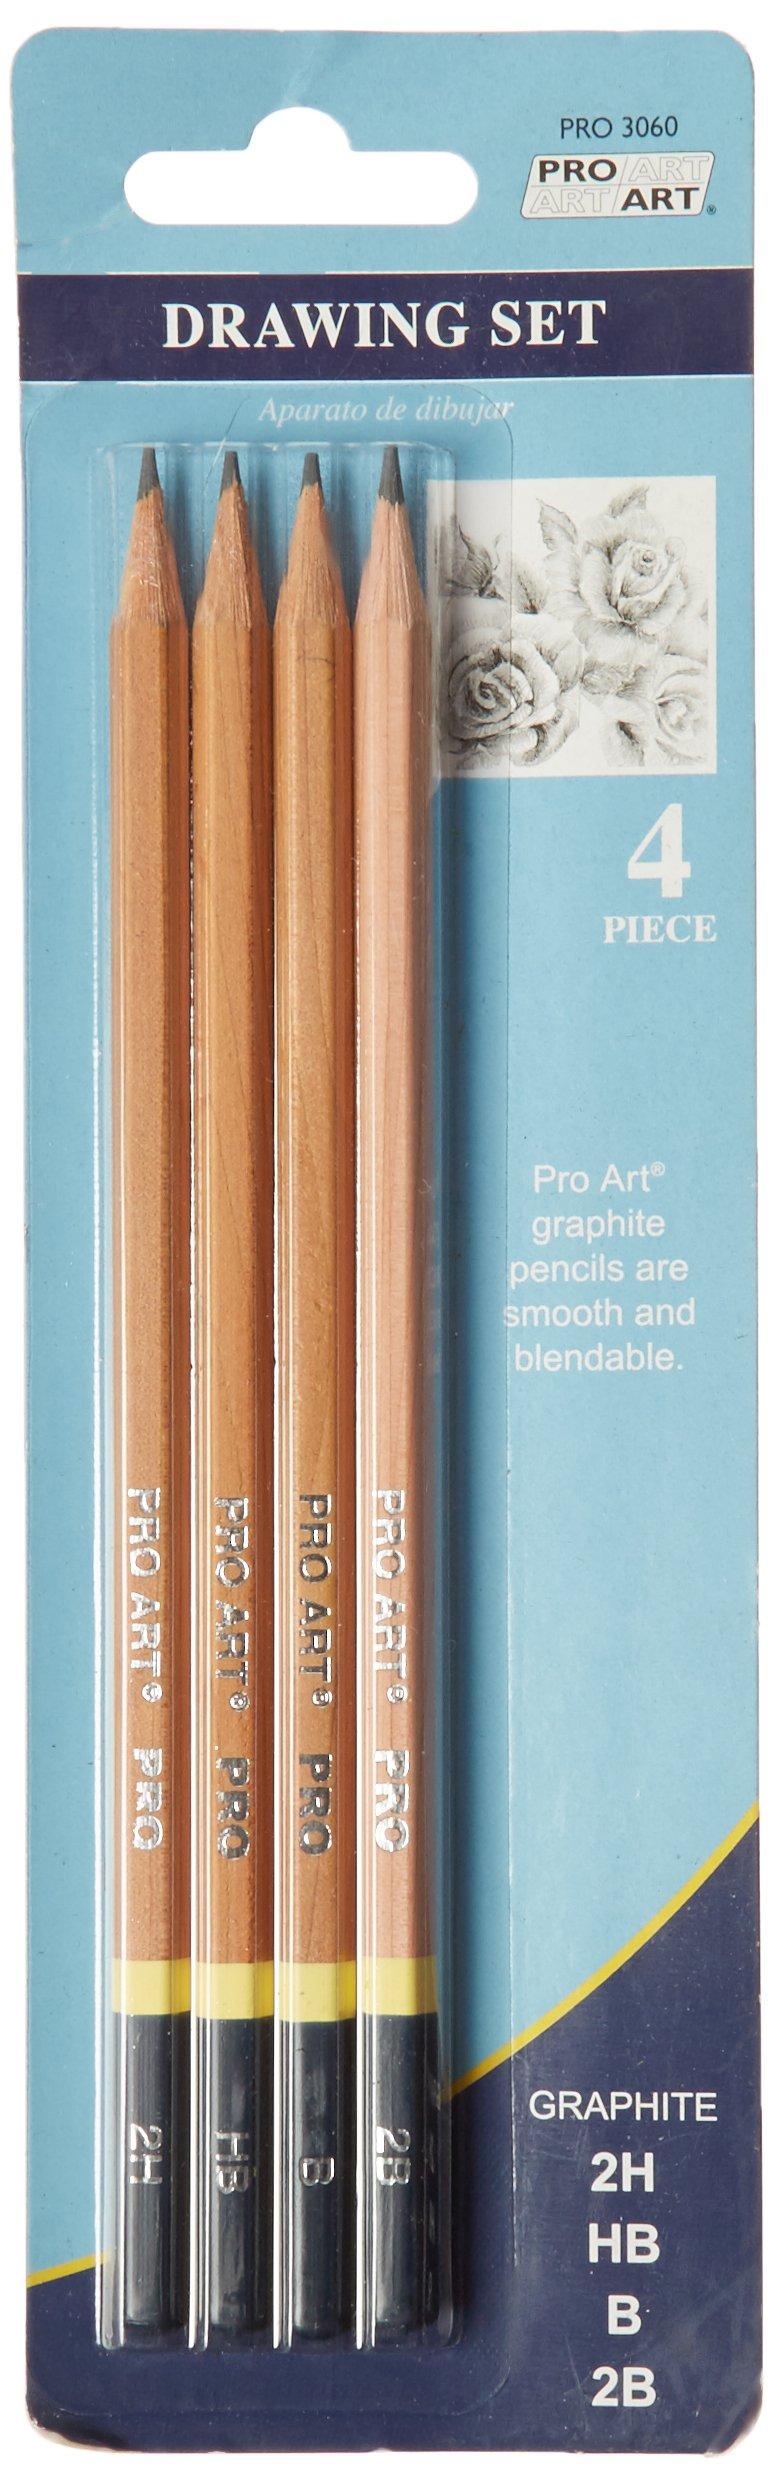 Pro Art Drawing Pencils 4/Pkg, 2H, HB, B & 2B